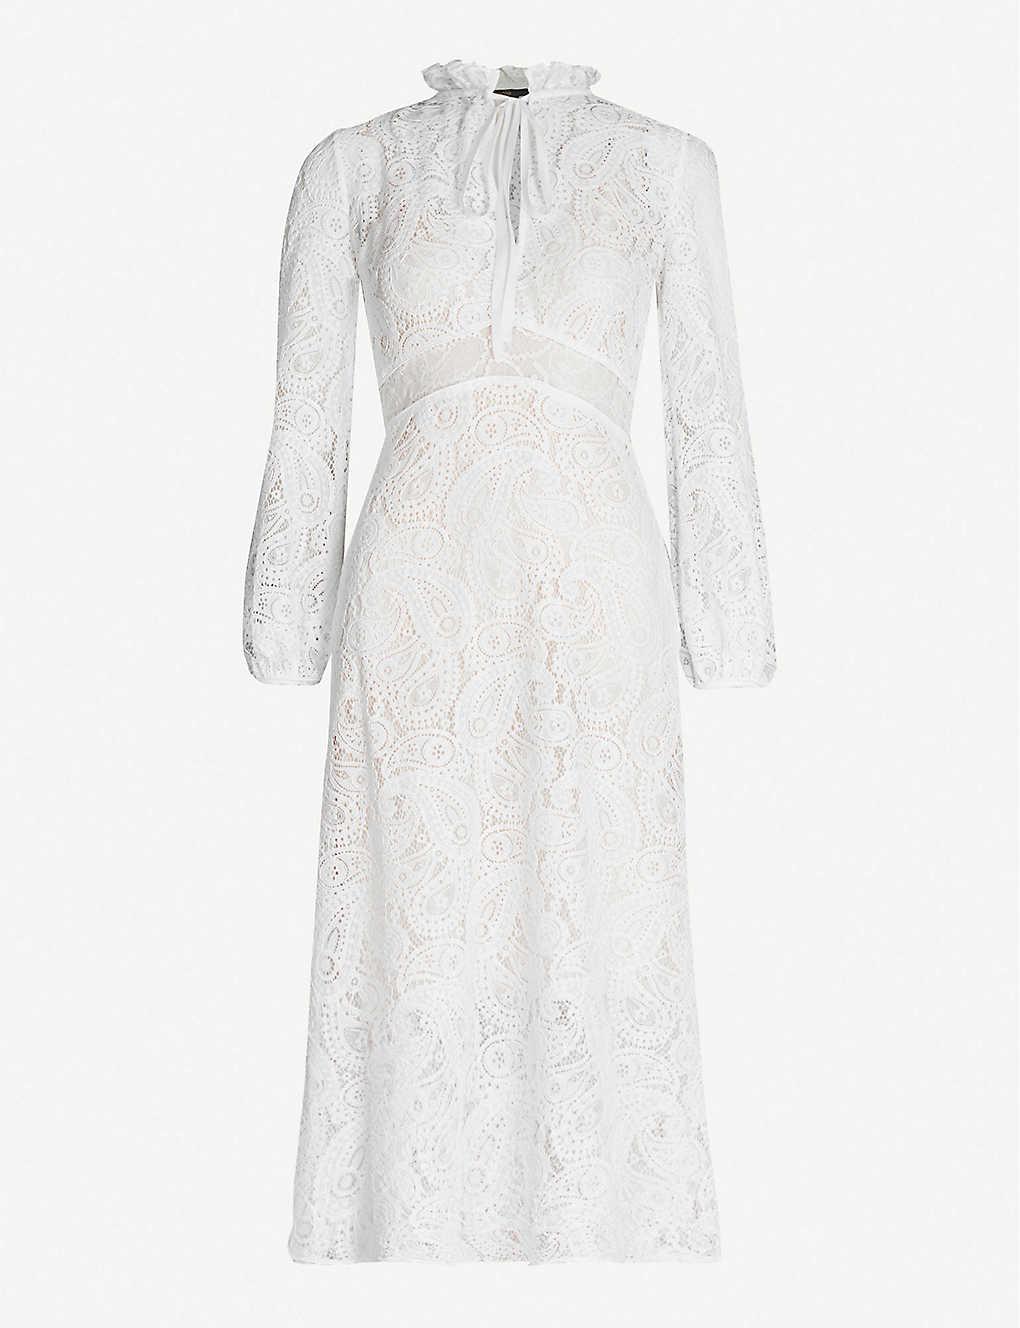 Maje Paisley Long Sleeve Midi Lace White Dress We Select